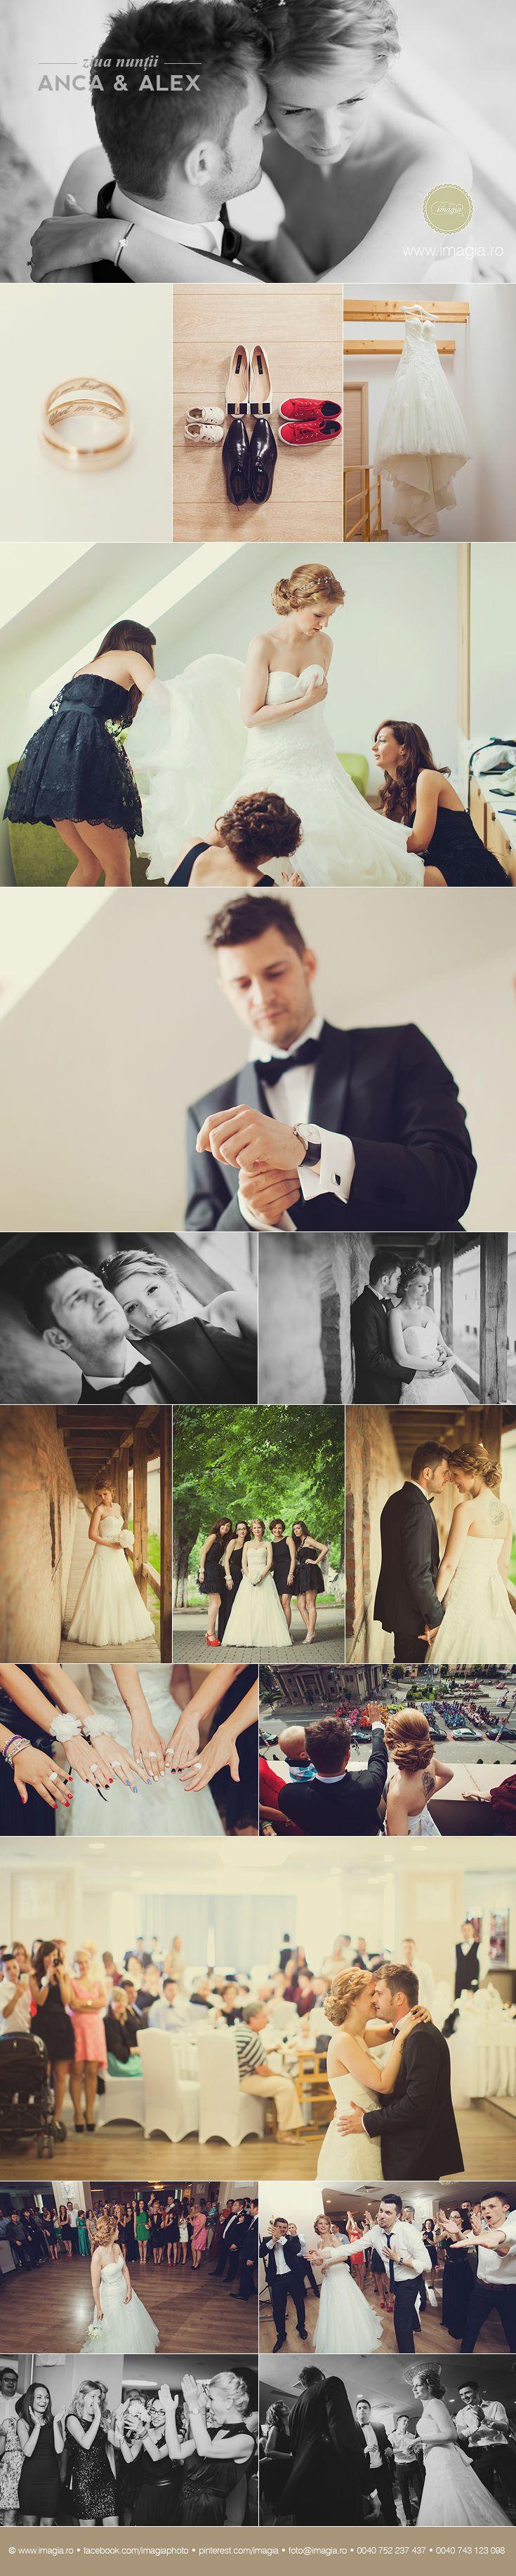 Great wedding in Targu Mures, Romania  Read more: http://www.imagia.ro/blogpage/foto-nunta-in-targu-mures-anca-si-alex-chertes  © www.imagia.ro